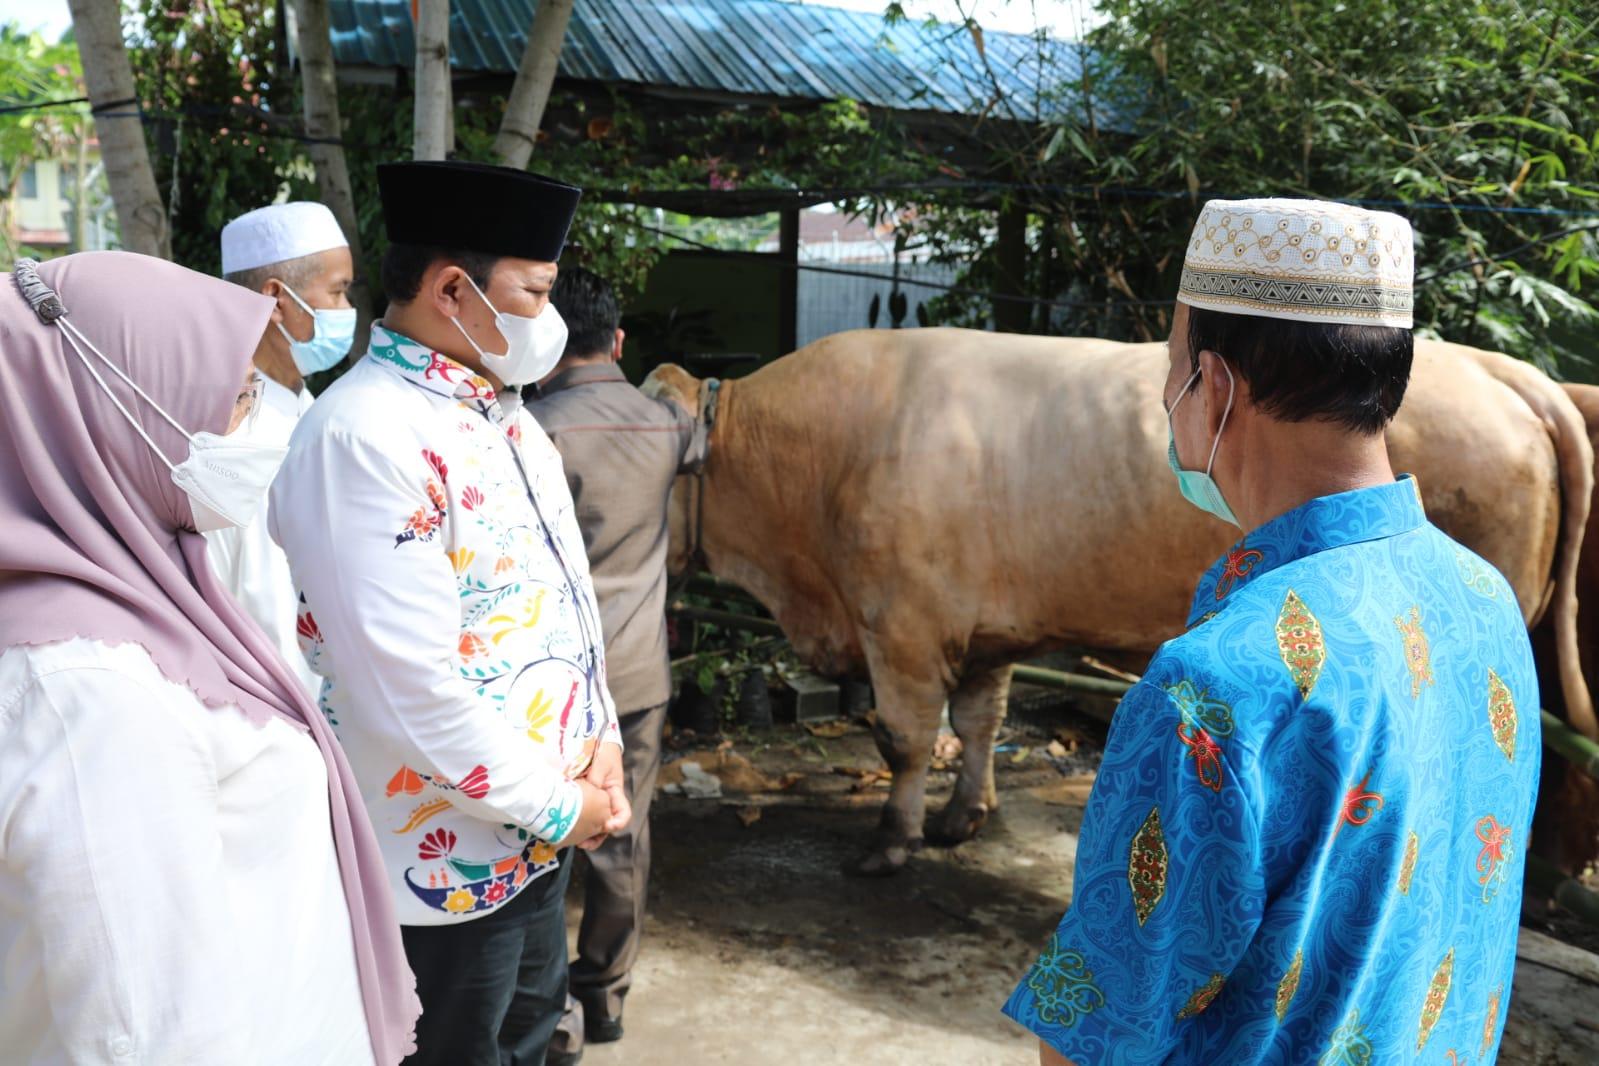 Penyerahan sapi Banpres oleh Wagub H. Edy Pratowo An. Gubernur Kalteng H. Sugianto Sabran di Kapuas